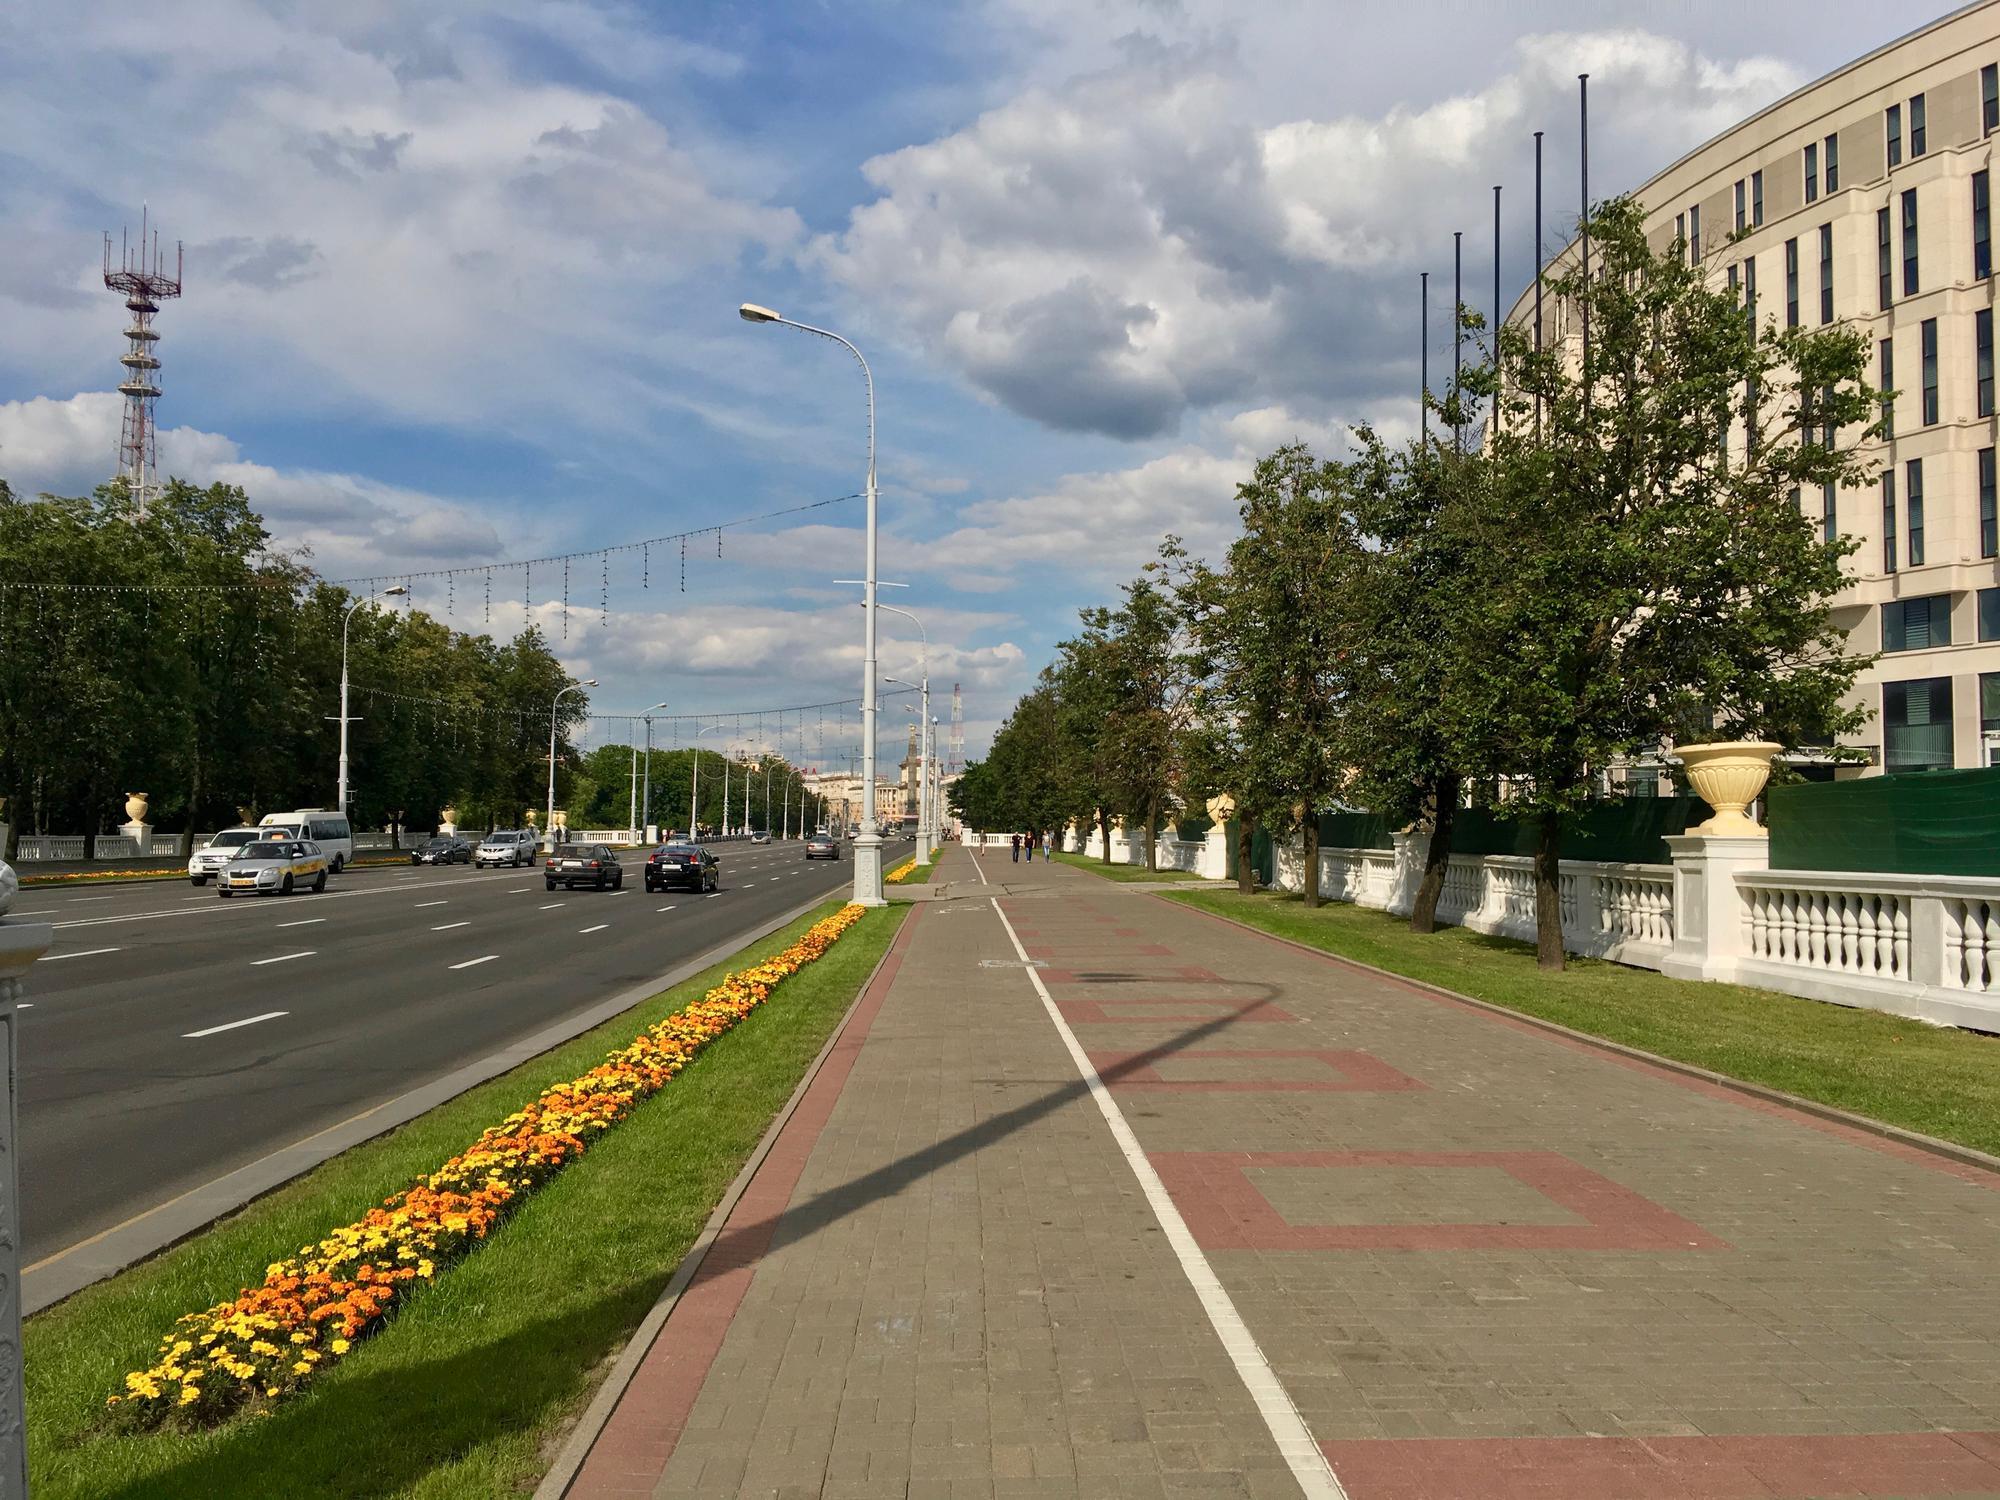 🇧🇾 Минск, Беларусь, июль 2017.